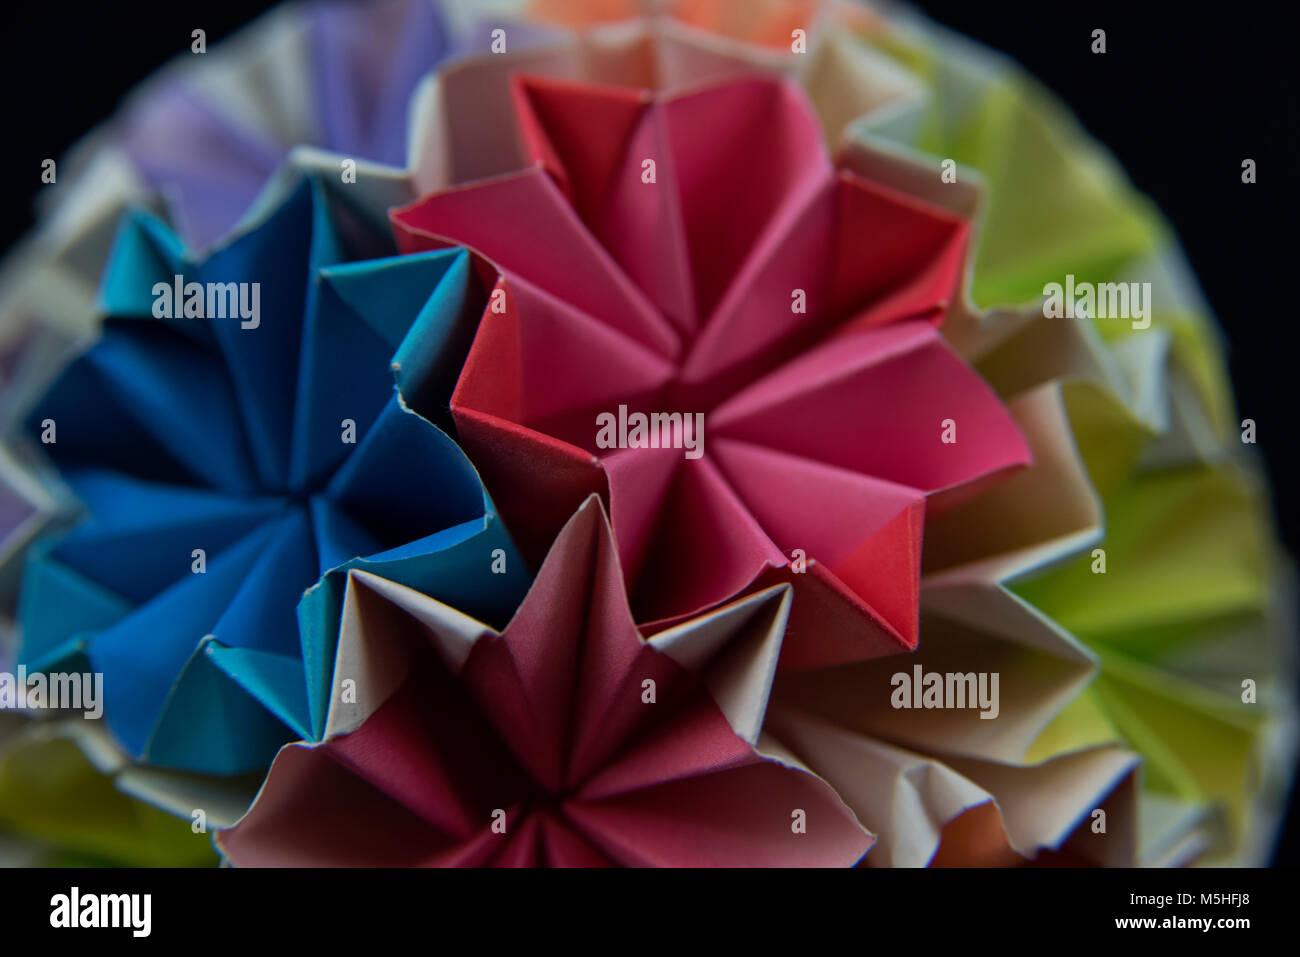 Origami Ball Close Up Stock Photo 175562416 Alamy